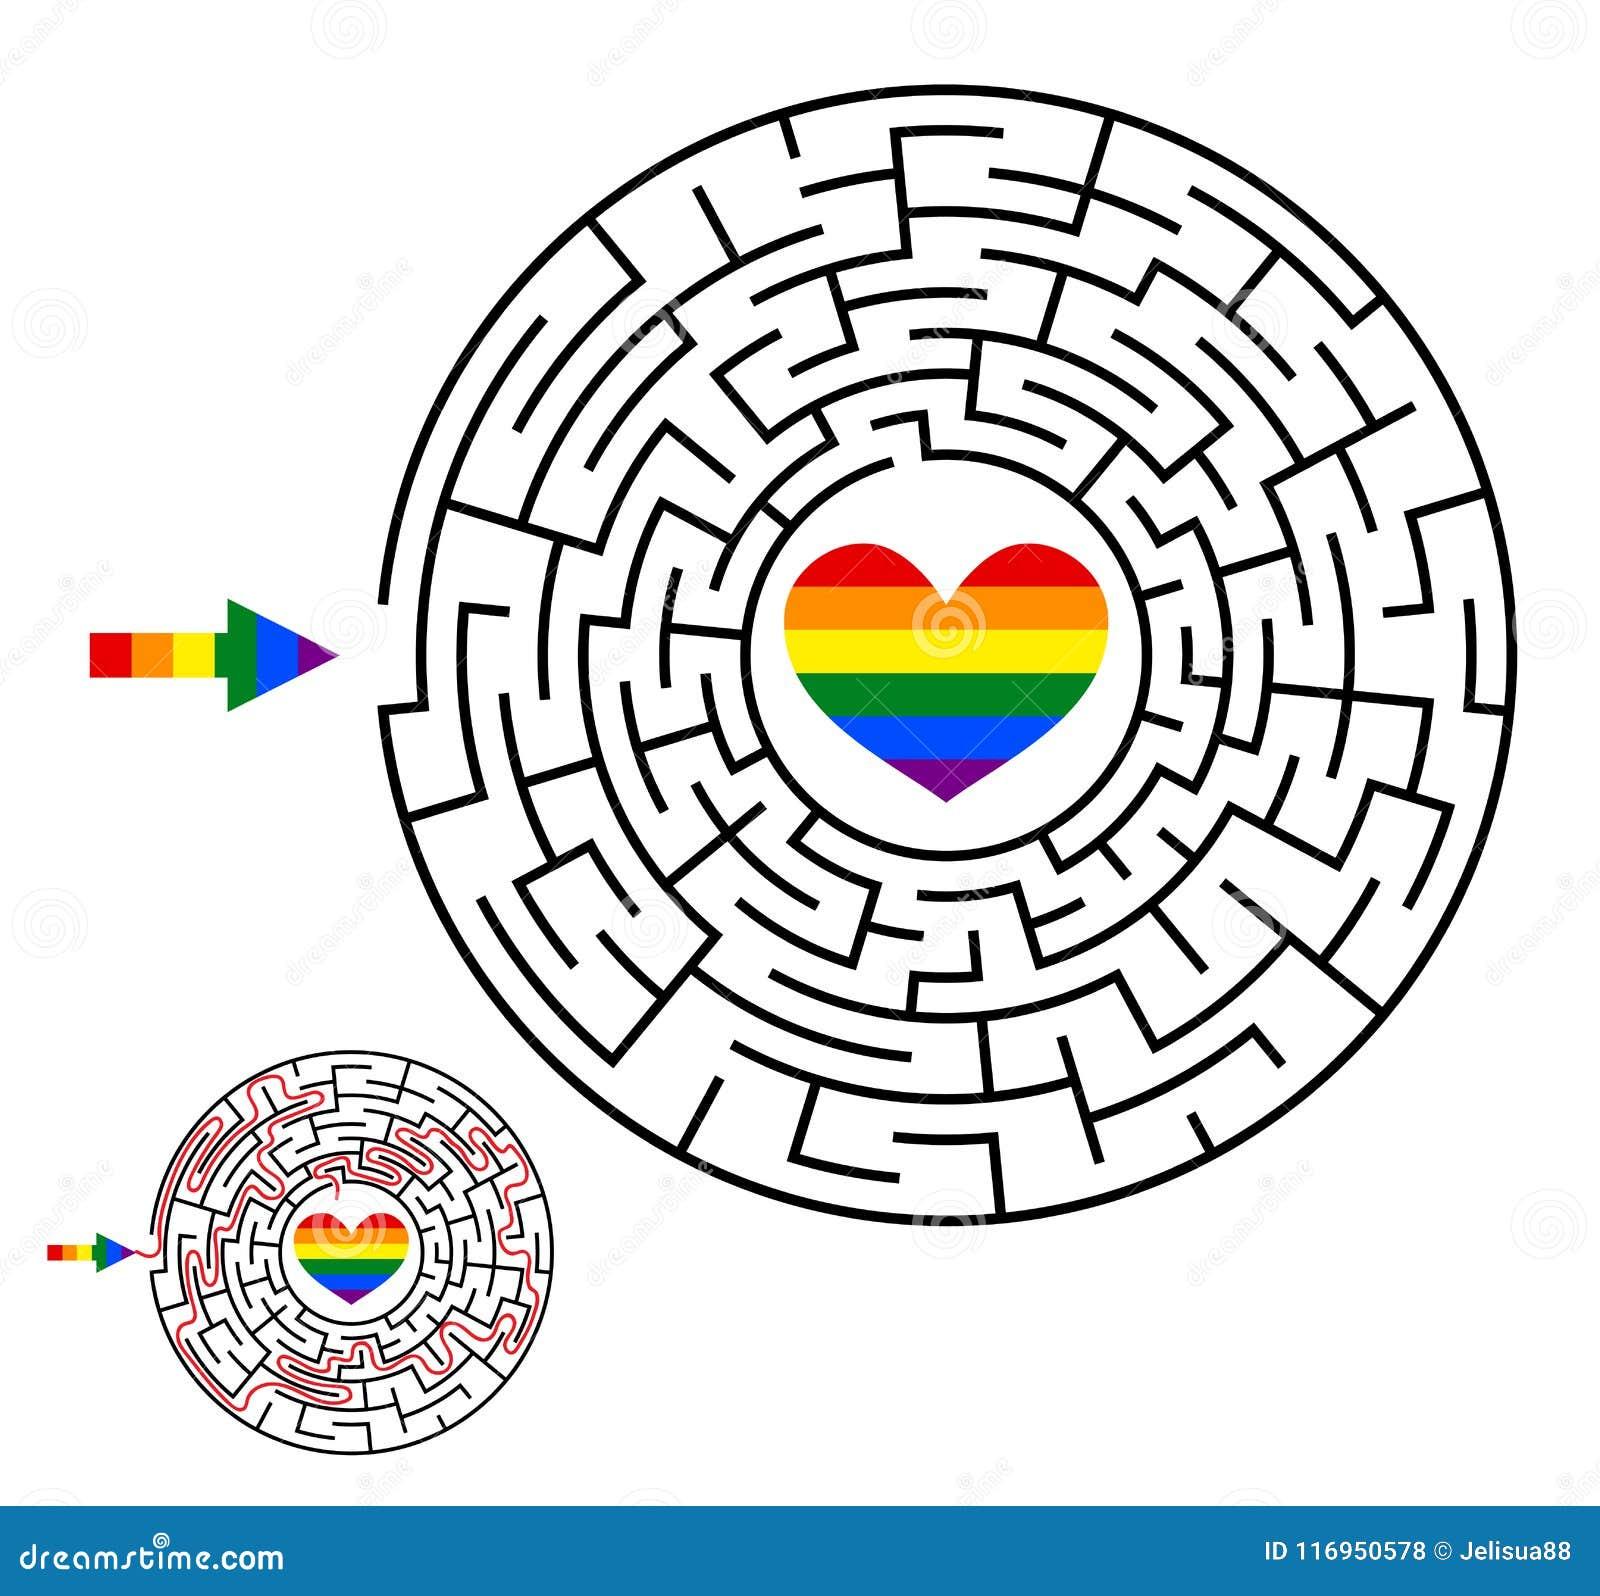 Gay bisexual transgender